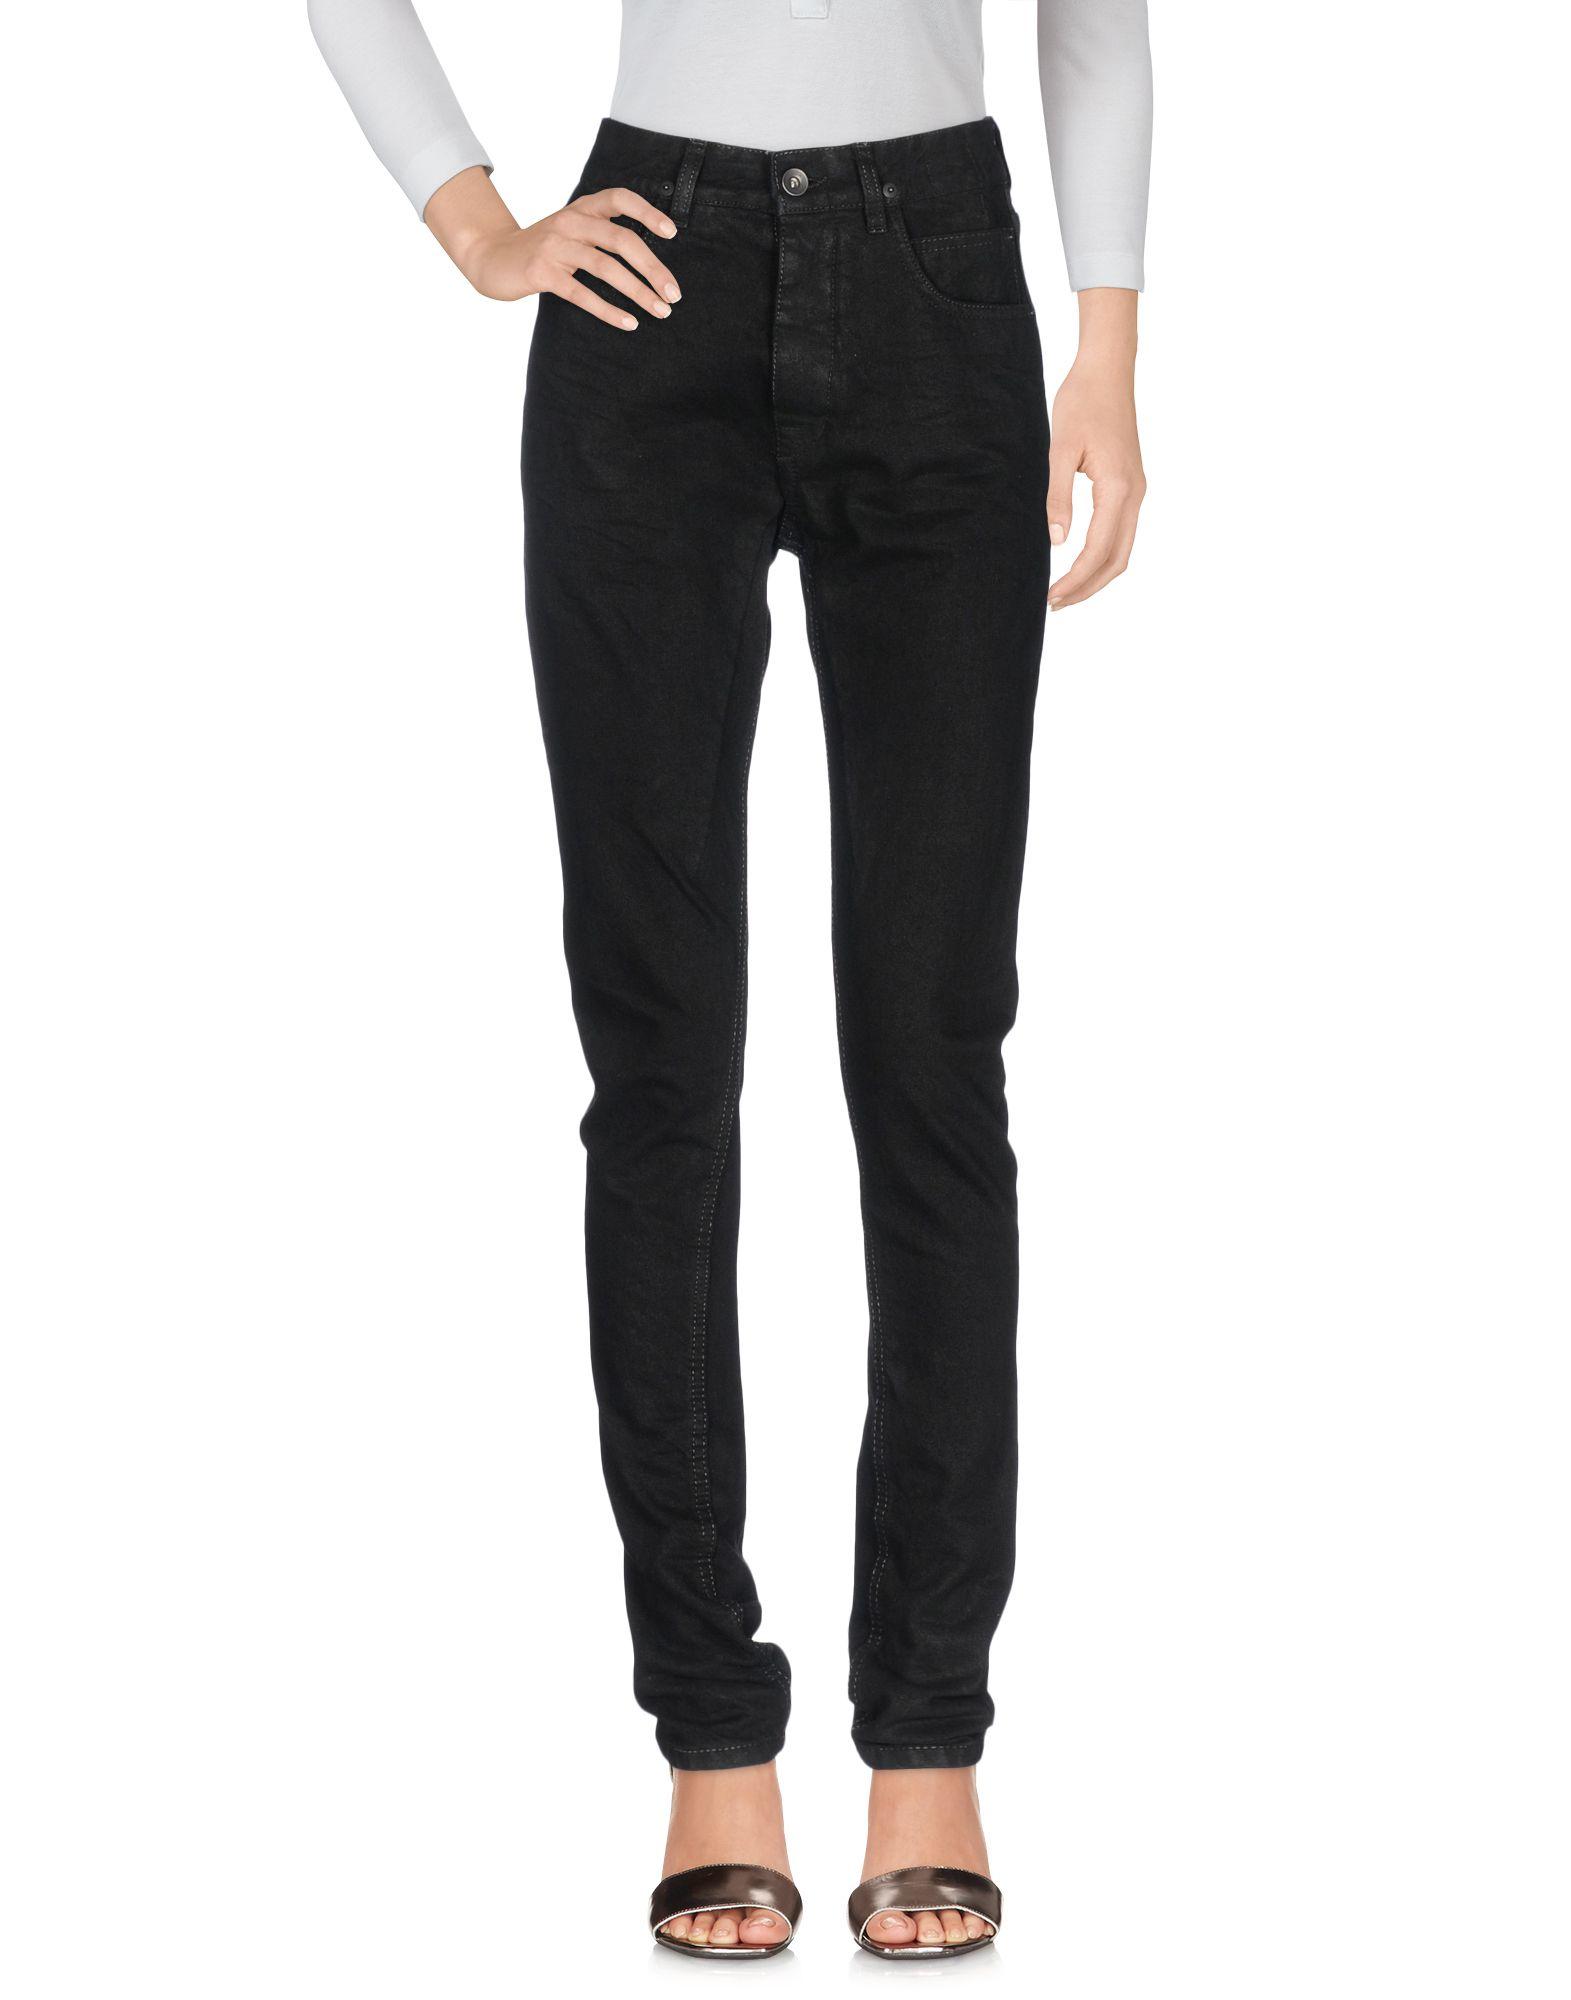 Pantaloni Jeans Drkshdw By Rick Owens Donna - Acquista online su nBv9r8e3Il